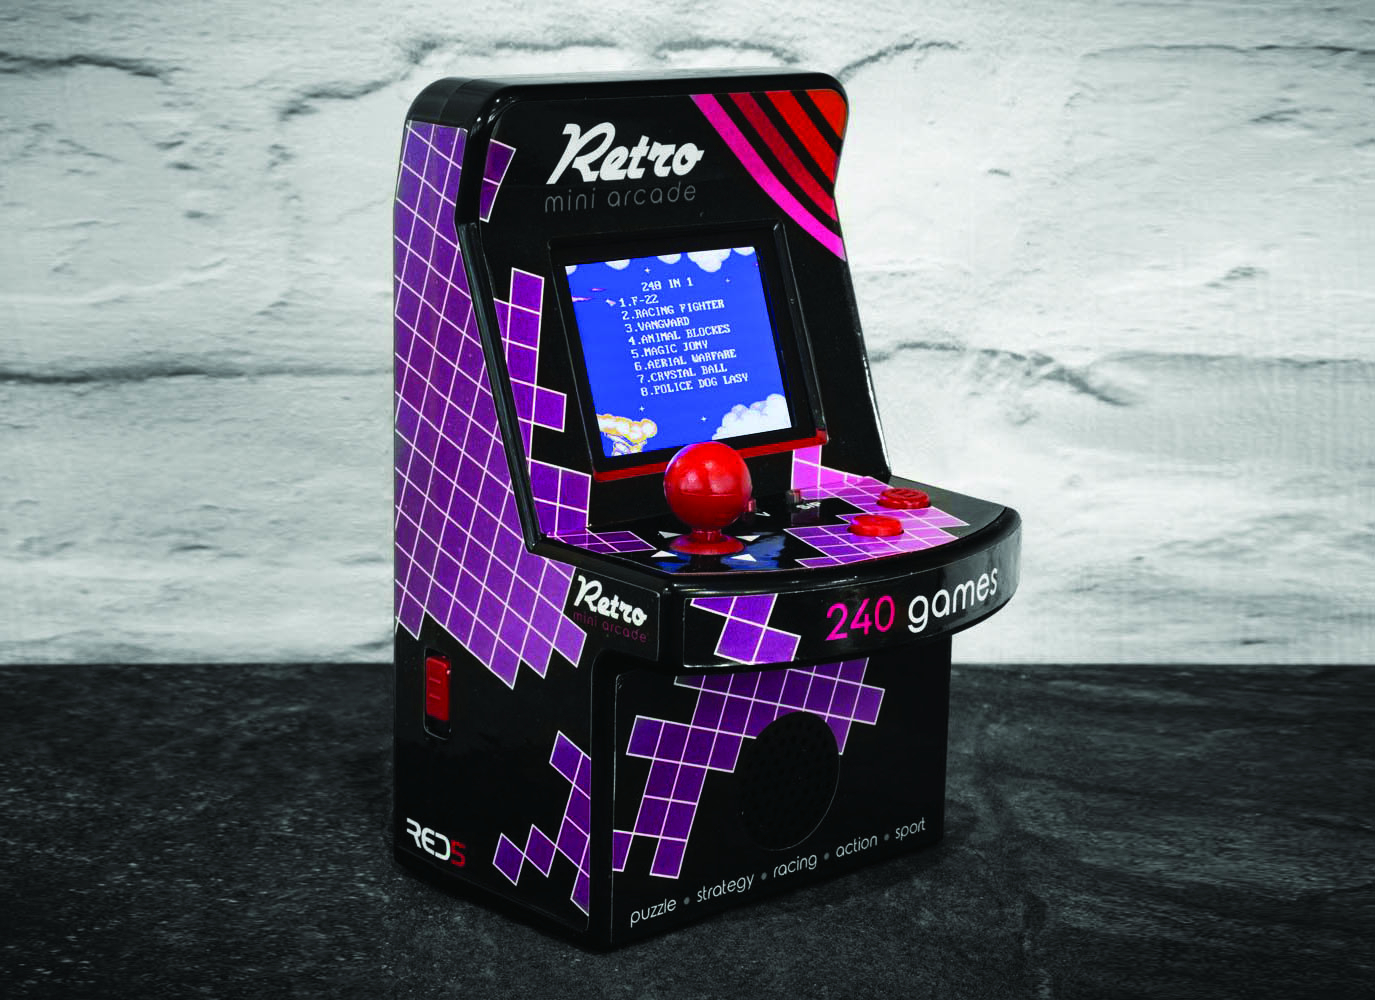 arcade-game-mini-retro-240-jocuri-2862-6235